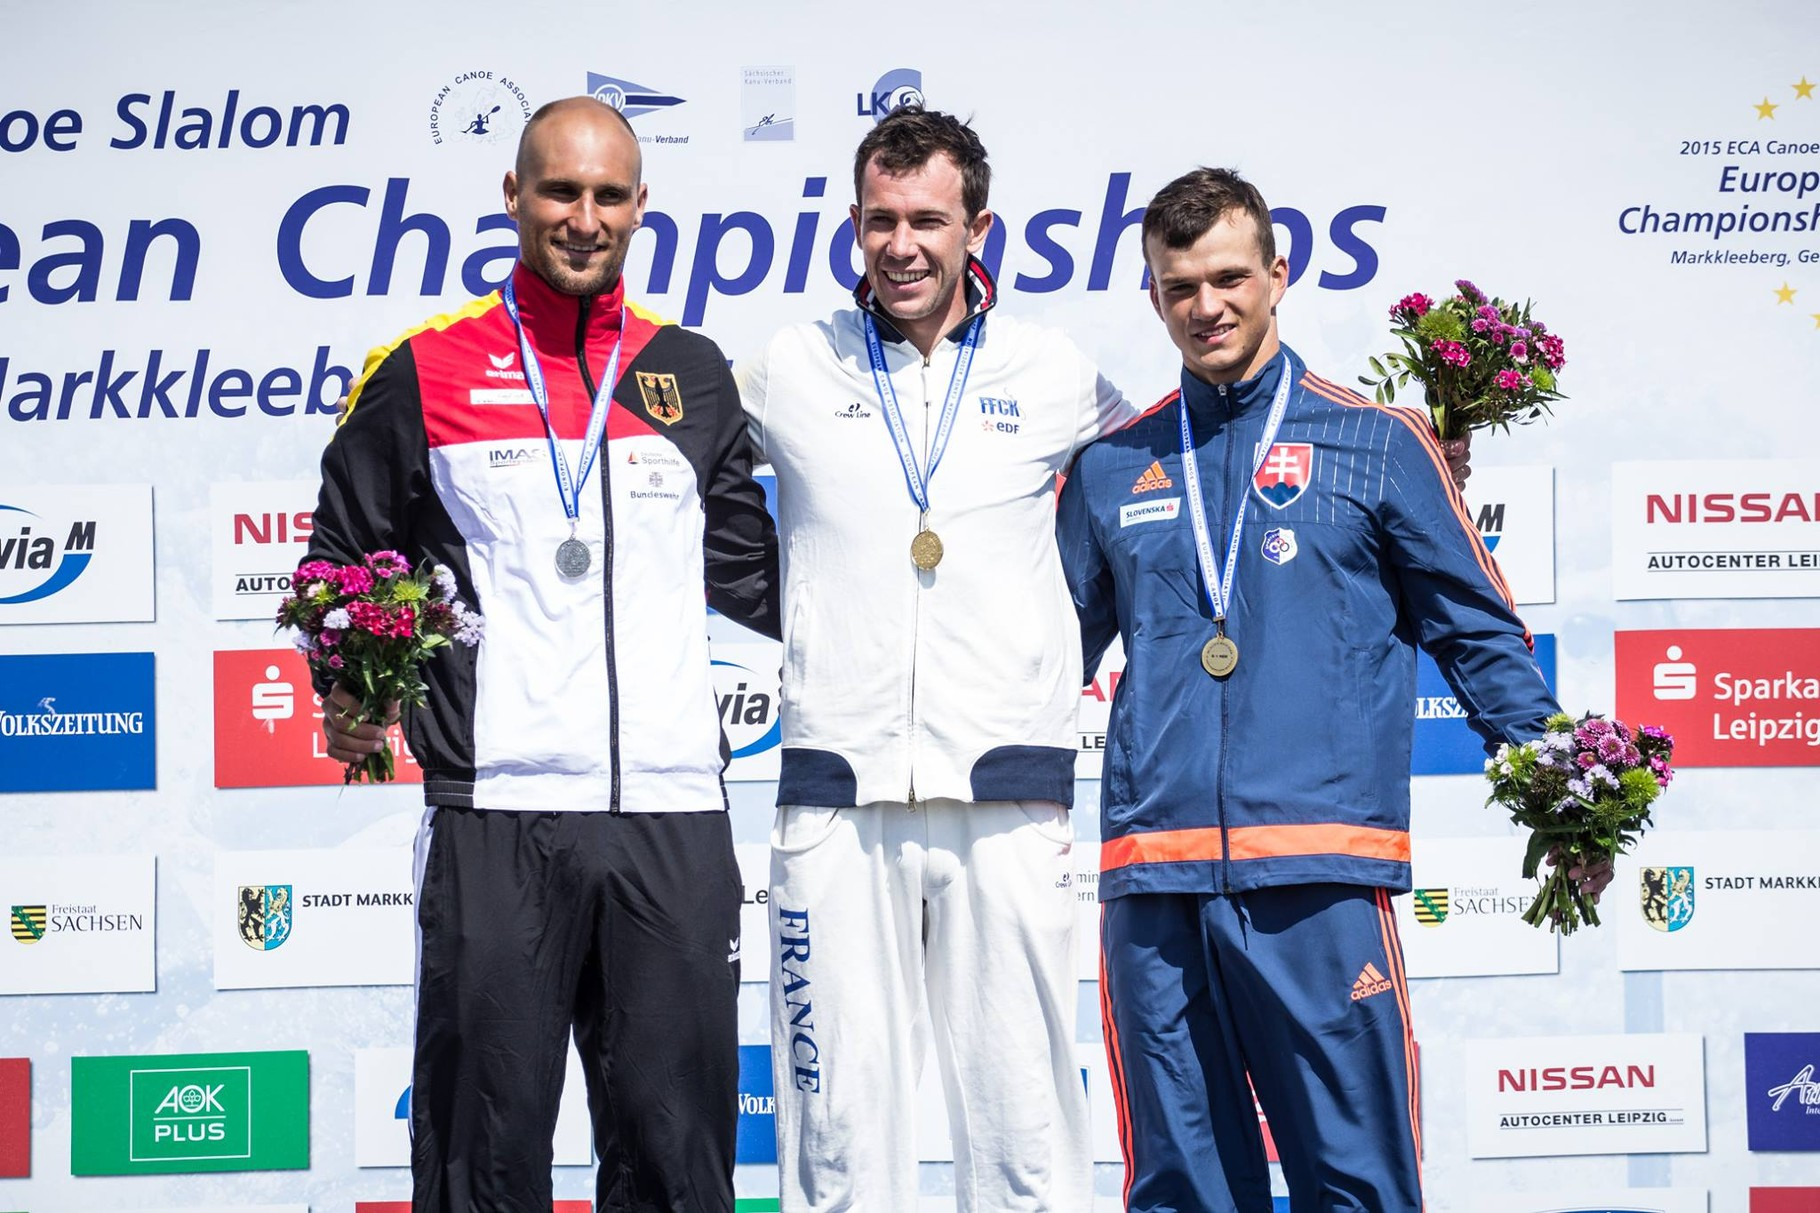 Vize-Europameister 2015